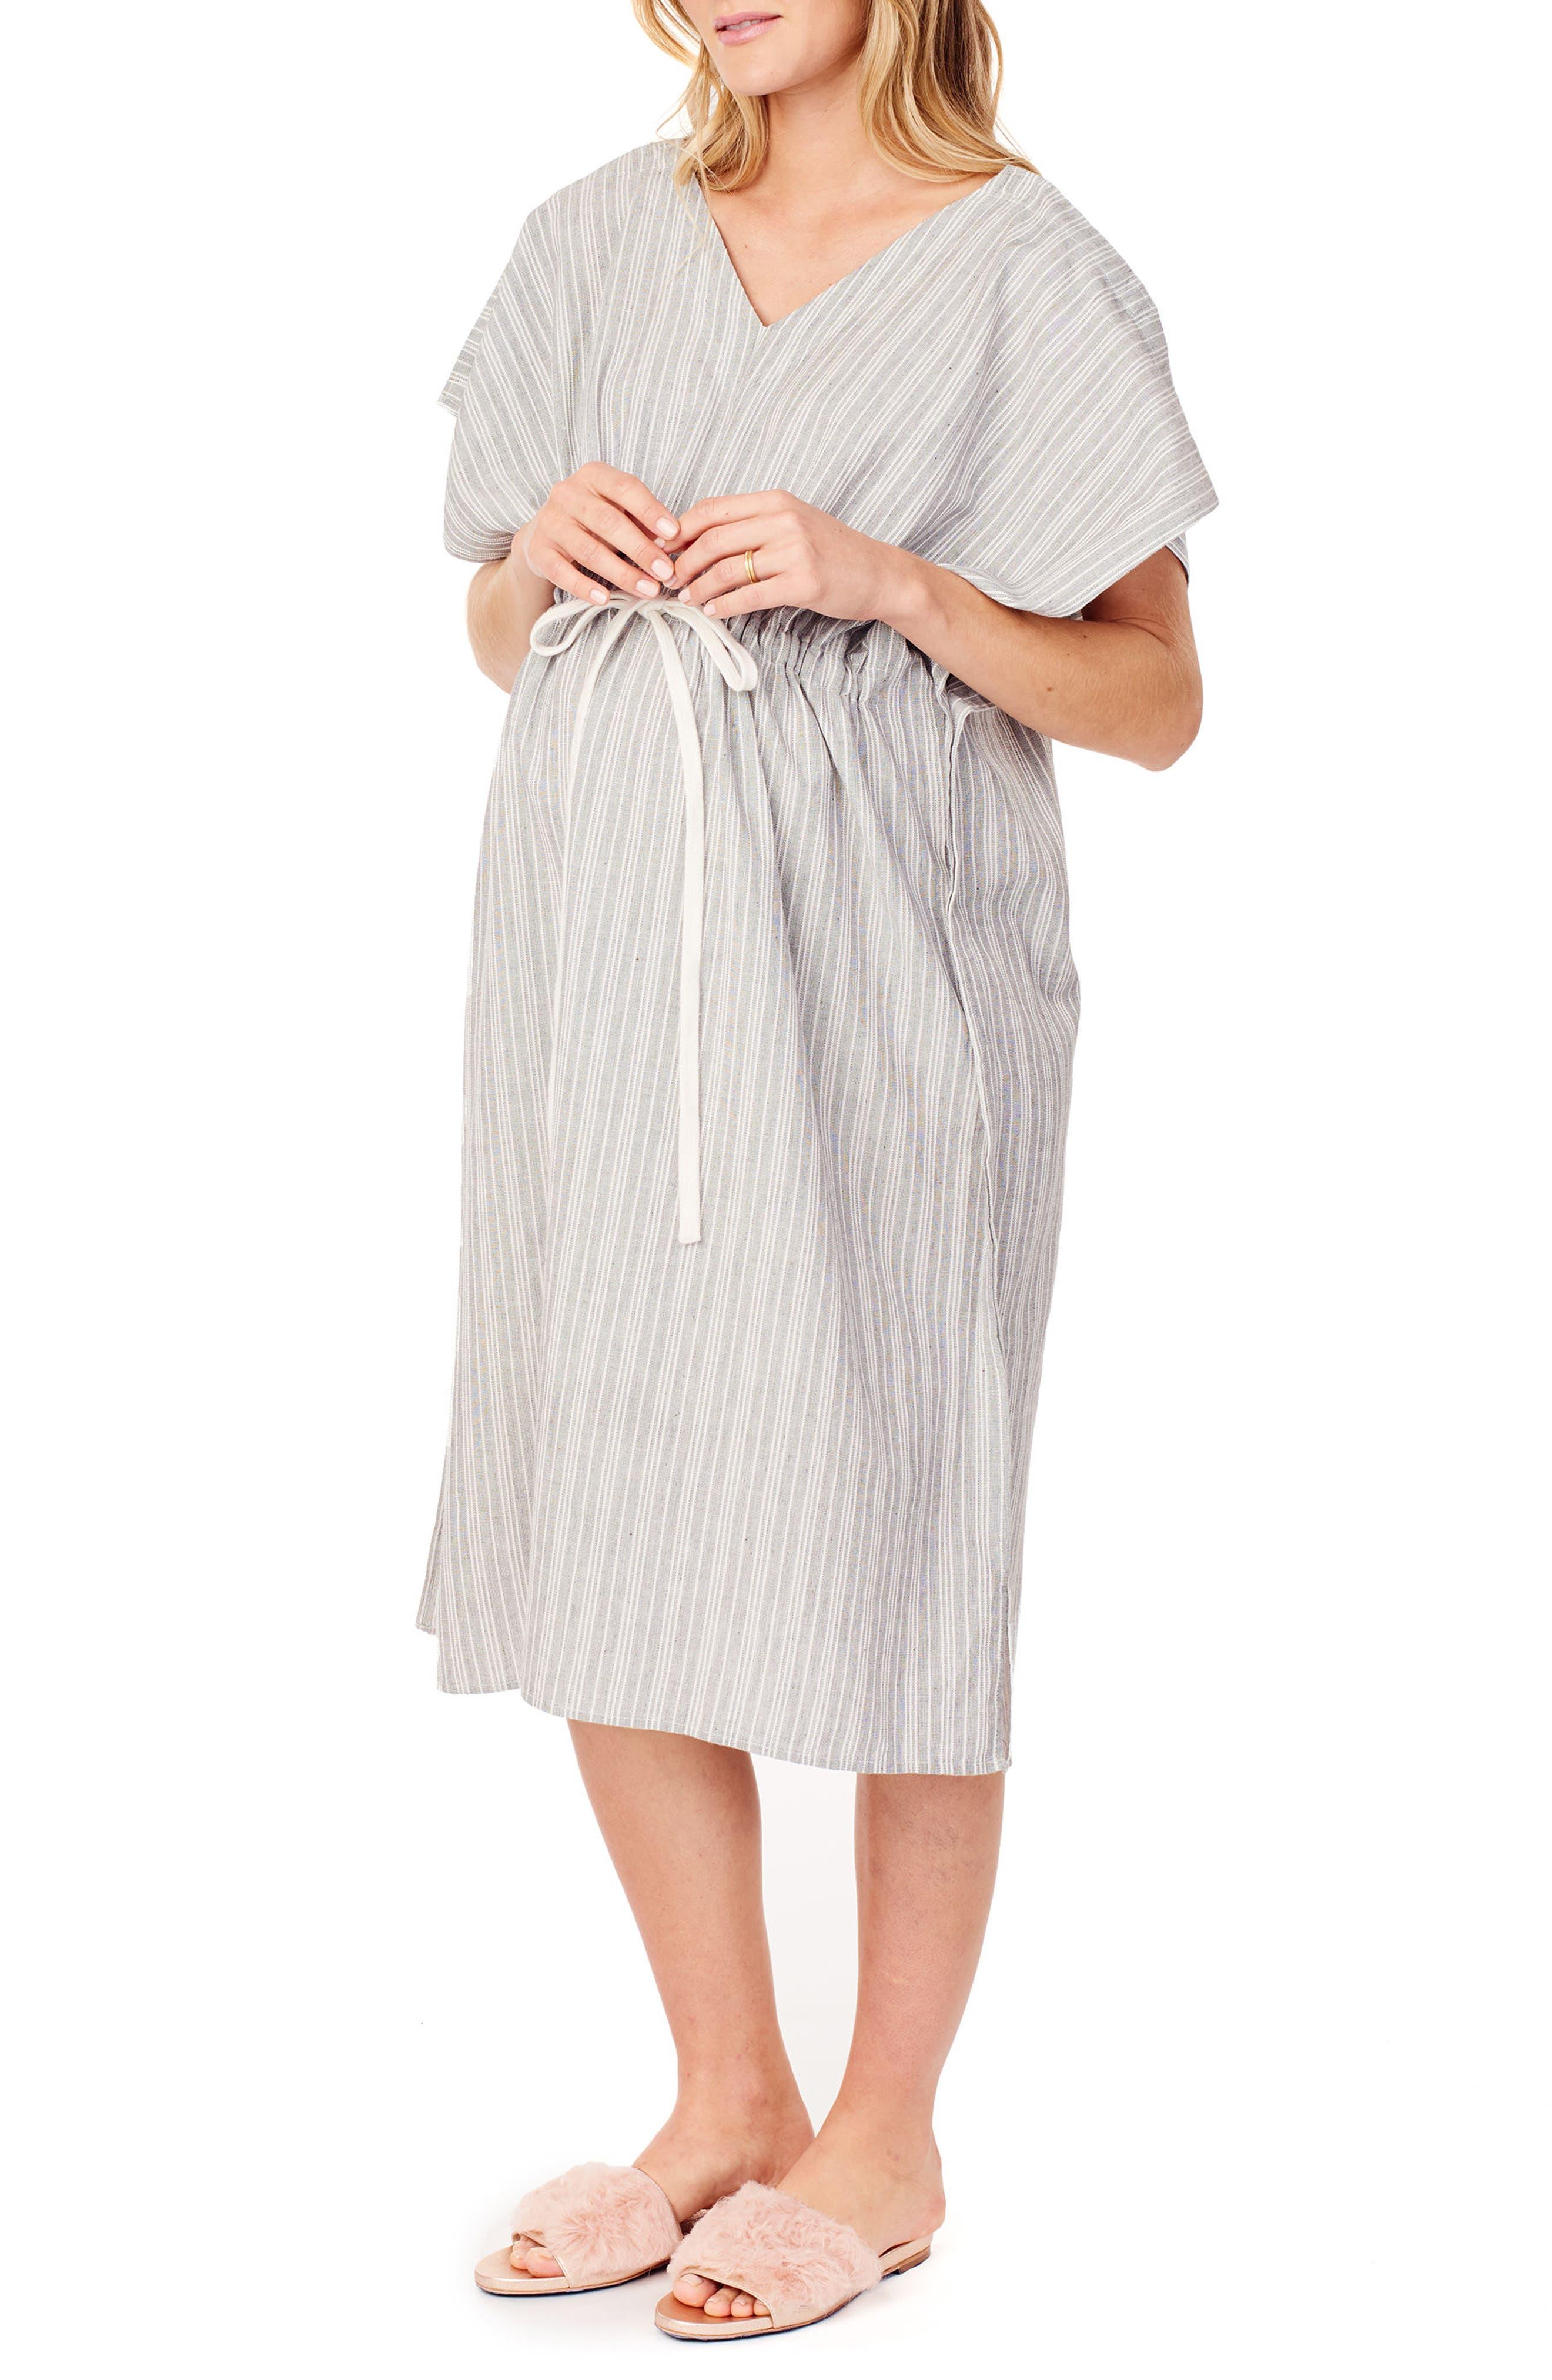 x James Fox & Co. Maternity/Nursing Hospital Gown,                             Alternate thumbnail 4, color,                             BLACK/ WHITE DOBBY STRIPE